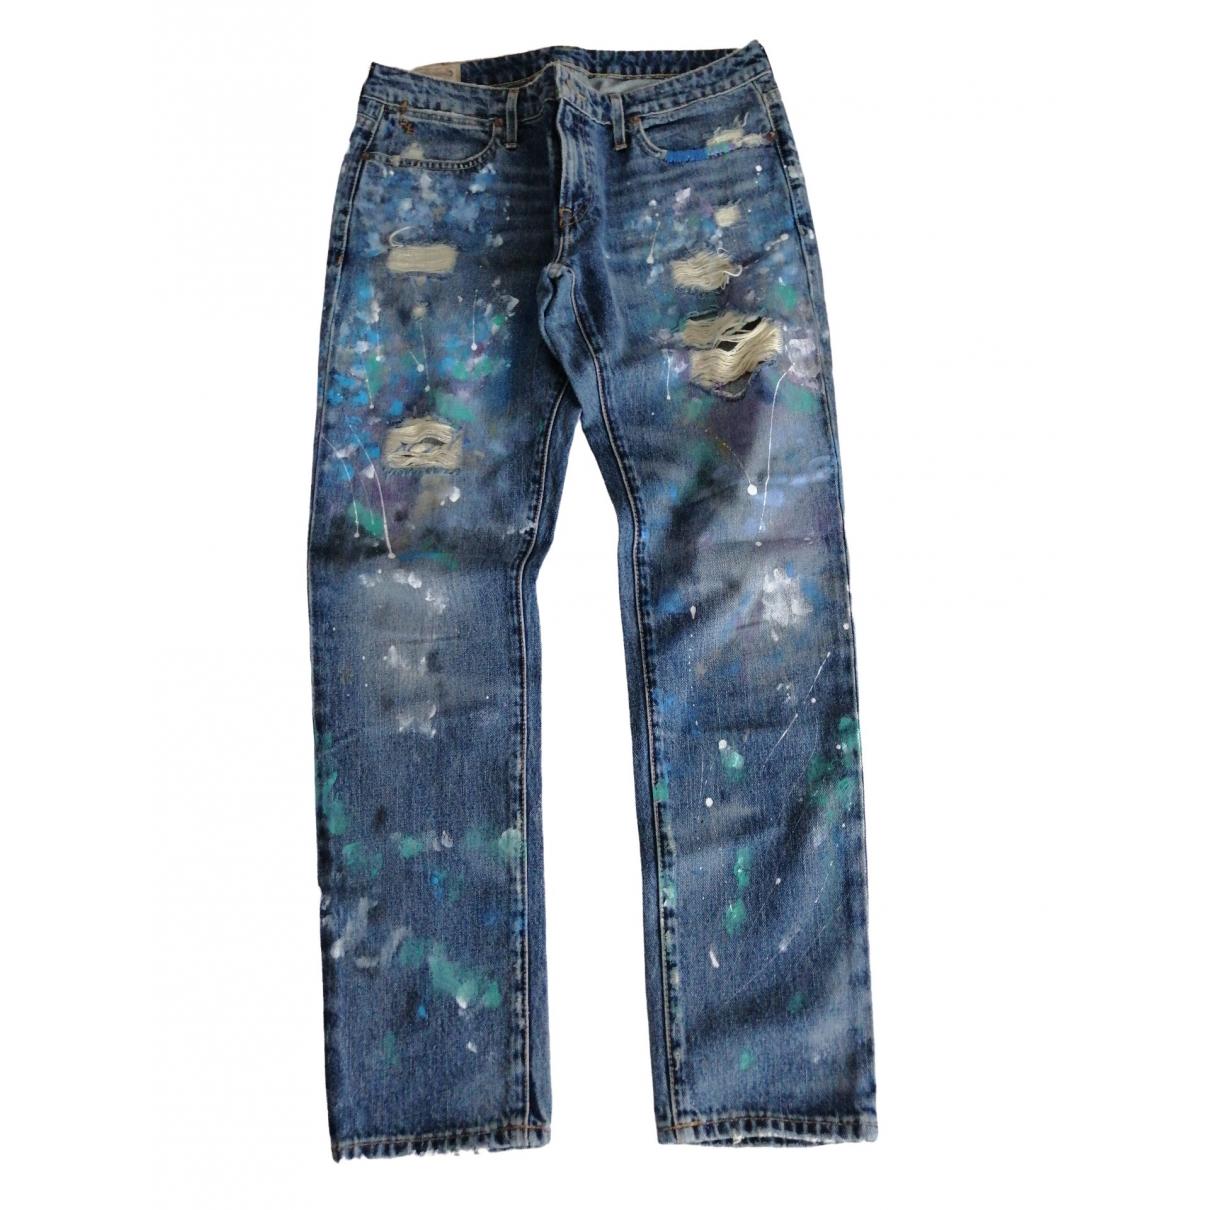 Polo Ralph Lauren \N Blue Denim - Jeans Jeans for Women 28 US